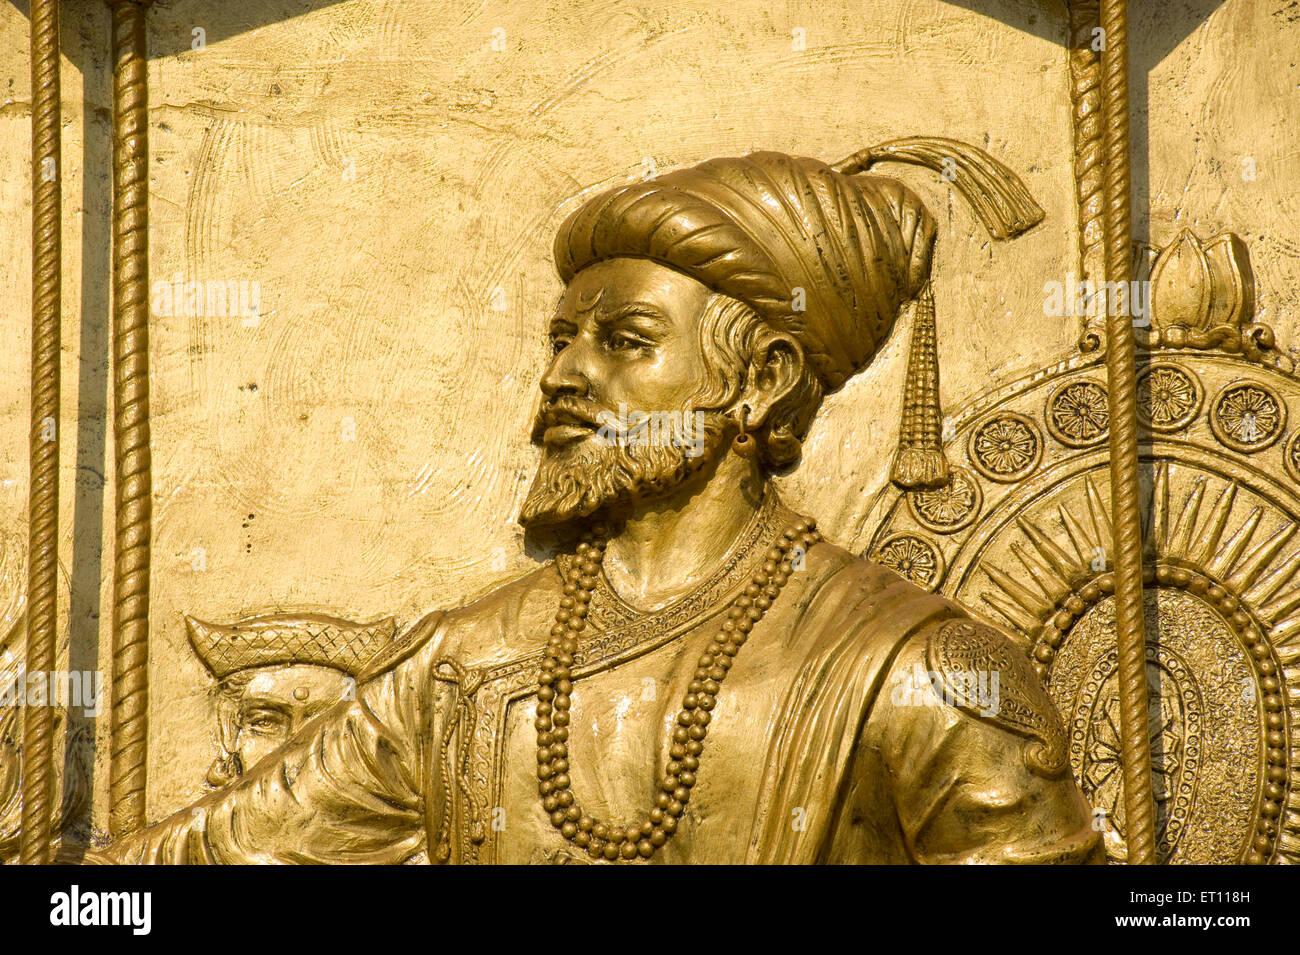 Sivaji Maharaj: Shivaji Maharaj Statue India Stock Photos & Shivaji